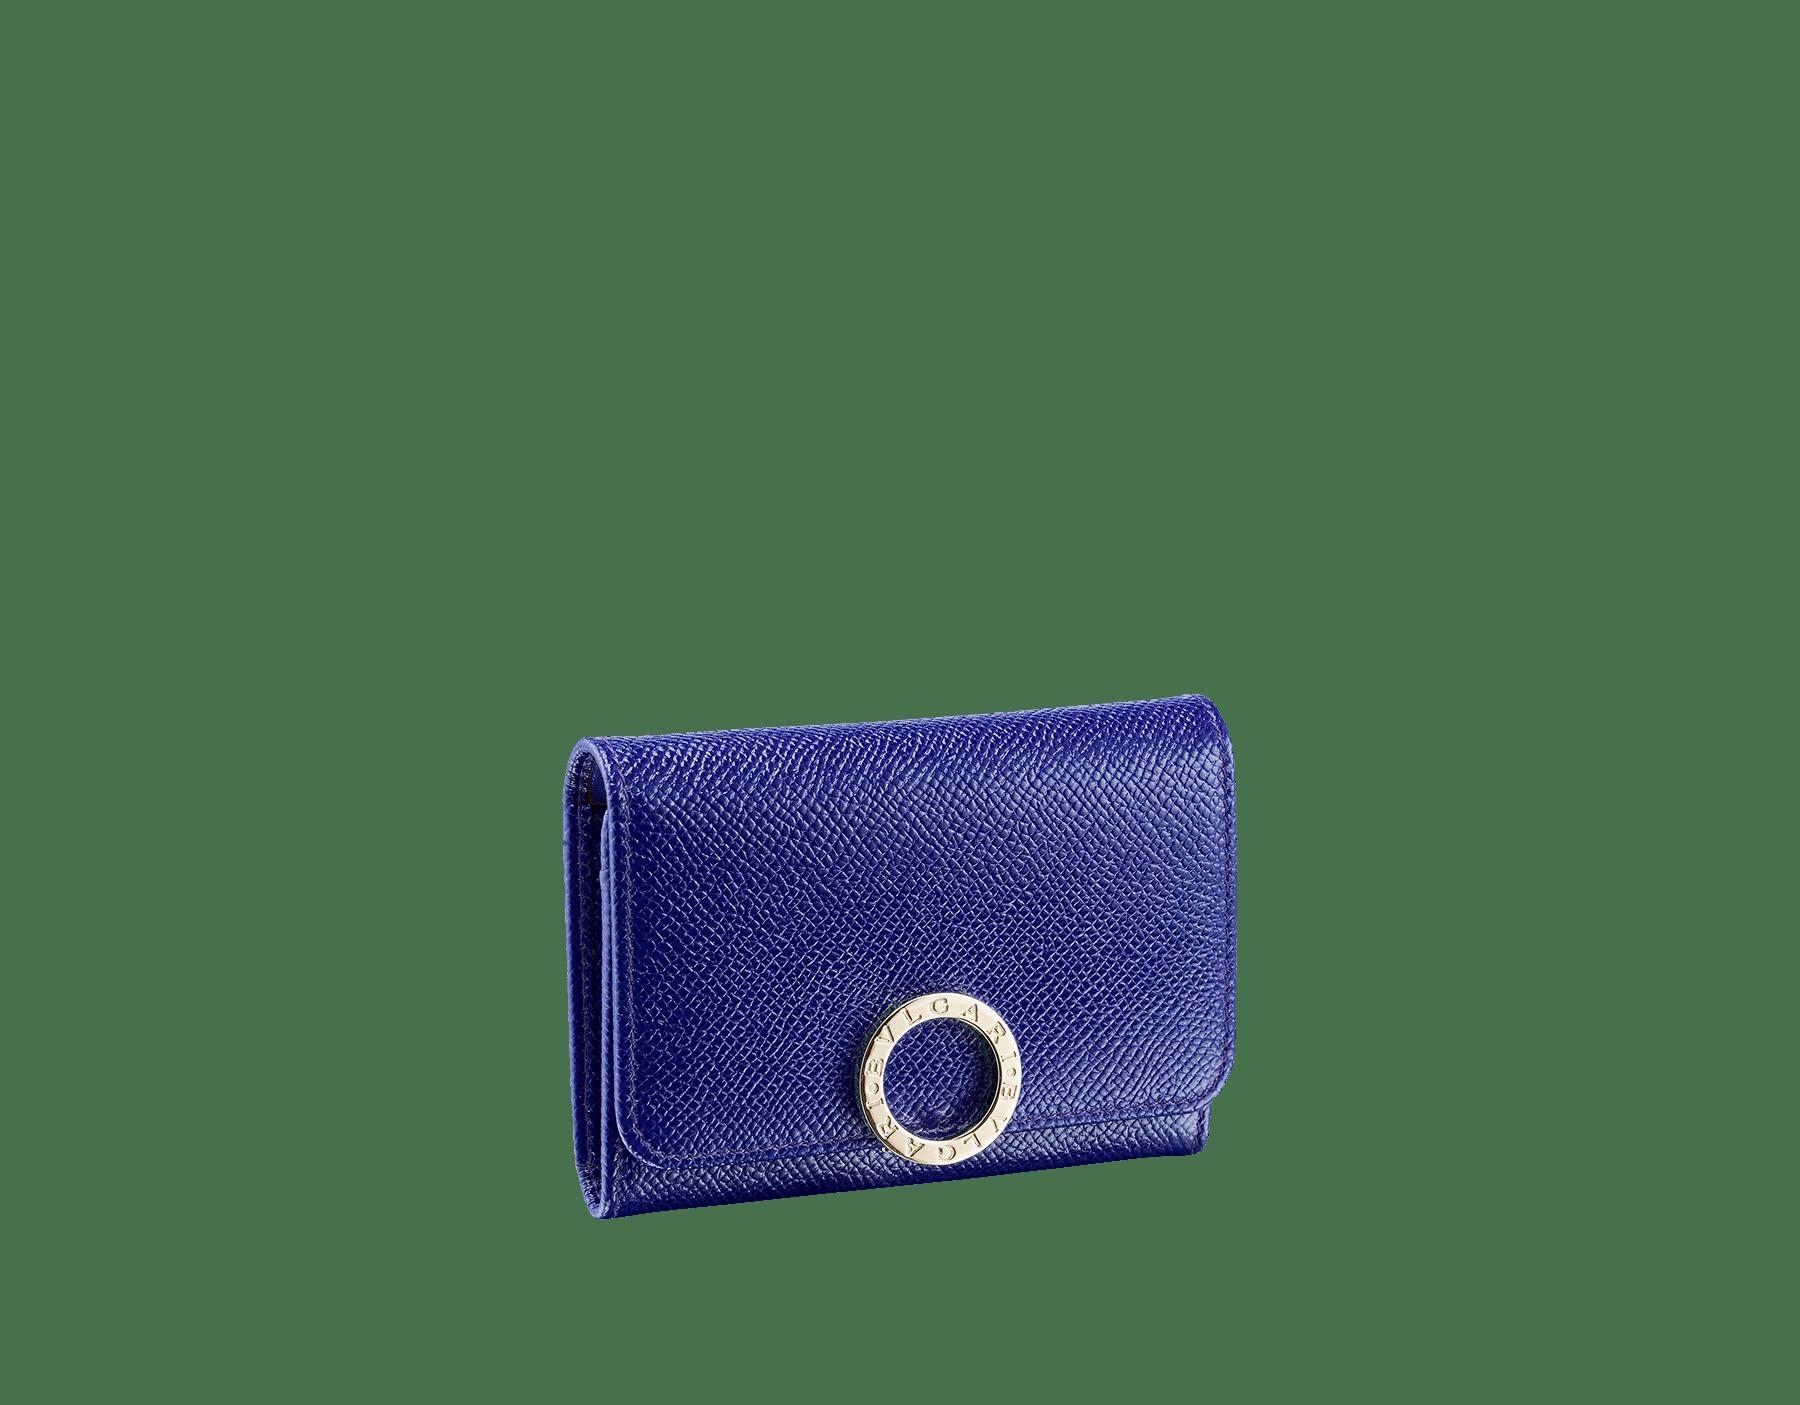 BVLGARI BVLGARI 名片夾,採用薄荷色亮珠面小牛皮和太妃石英色 Nappa 軟面皮。經典淡金色黃銅品牌標誌扣環。 579-BC-HOLDER-BGCLc image 1